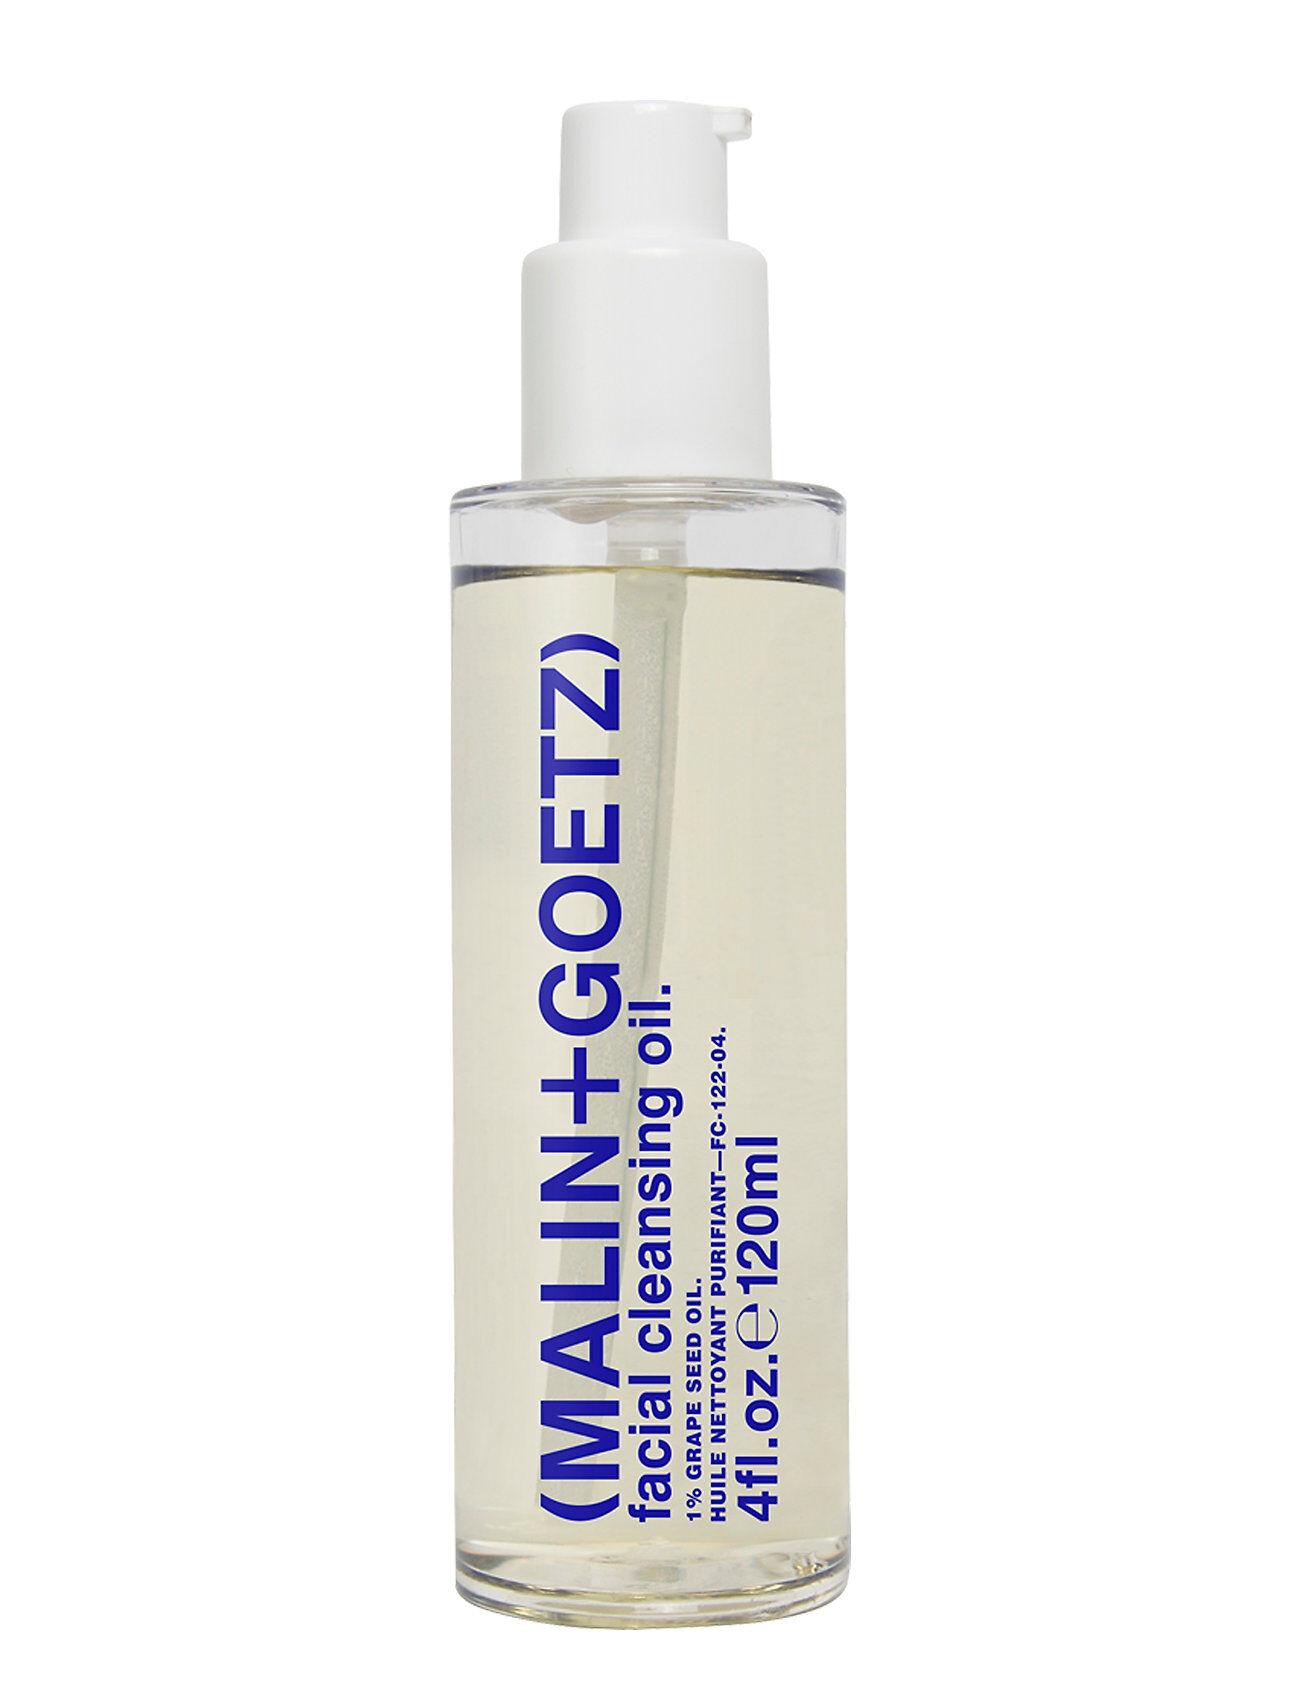 MALIN+GOETZ Facial Cleansing Oil Kasvojenpuhdistus Meikinpoisto Cleanser Nude MALIN+GOETZ